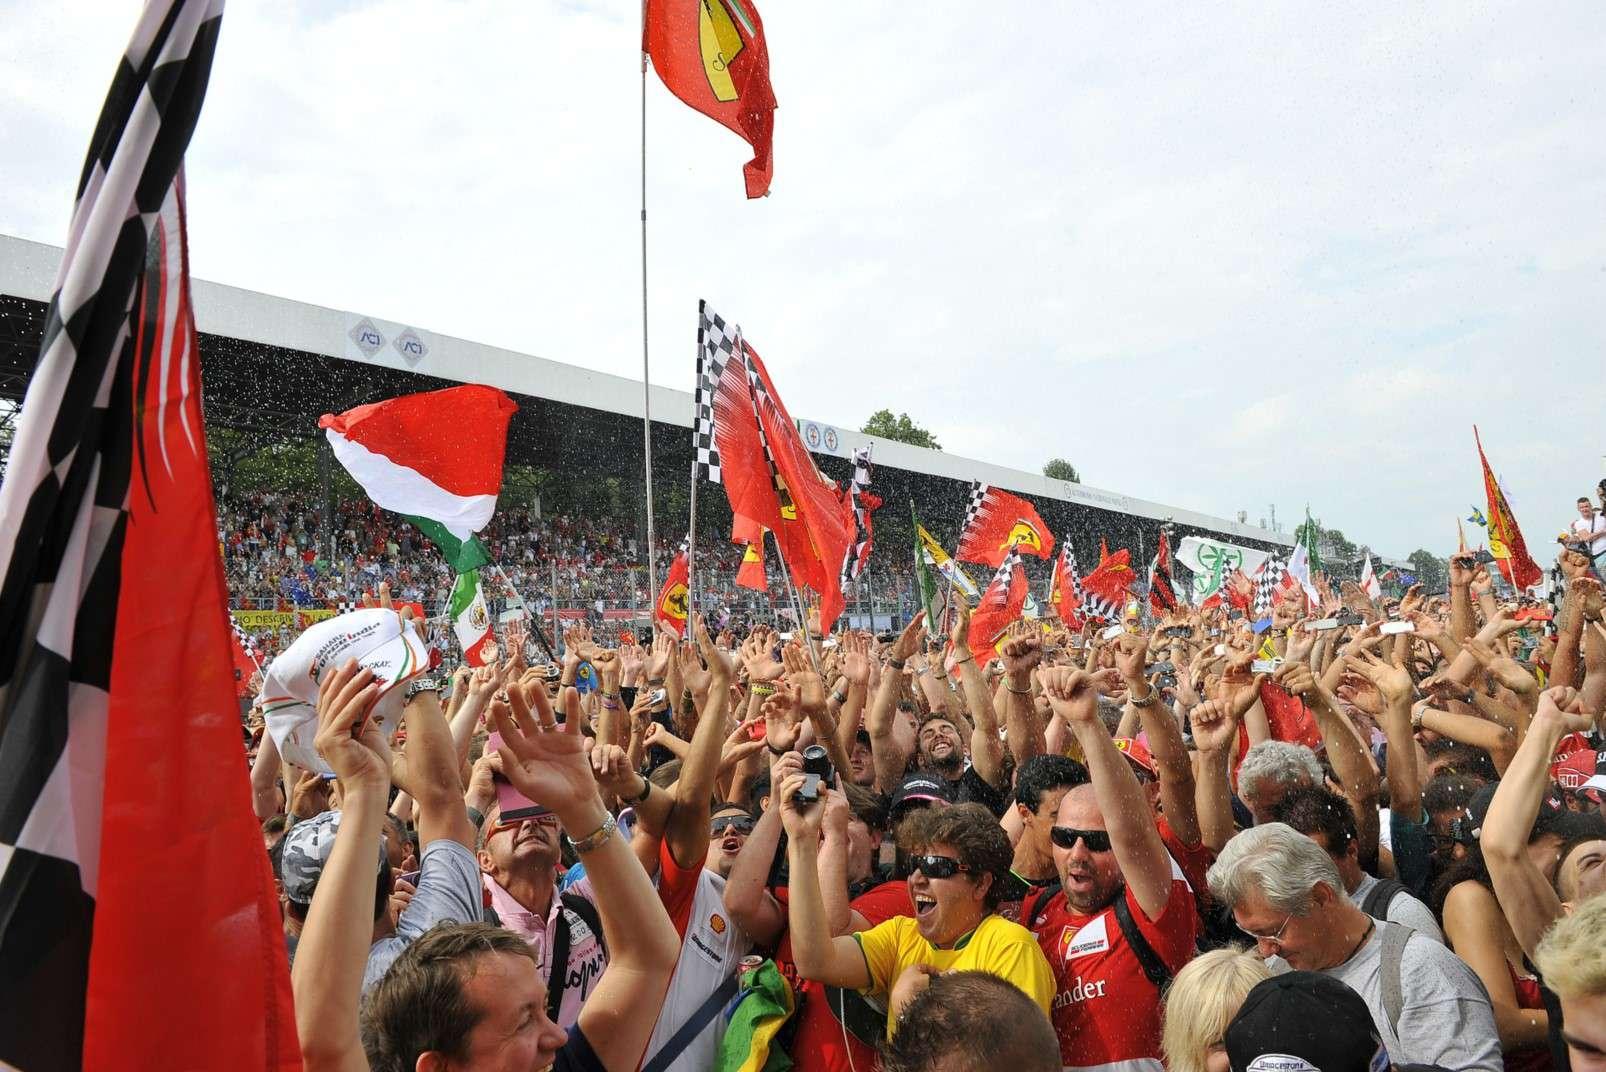 Ferrari tifosi at the Monza racetrack